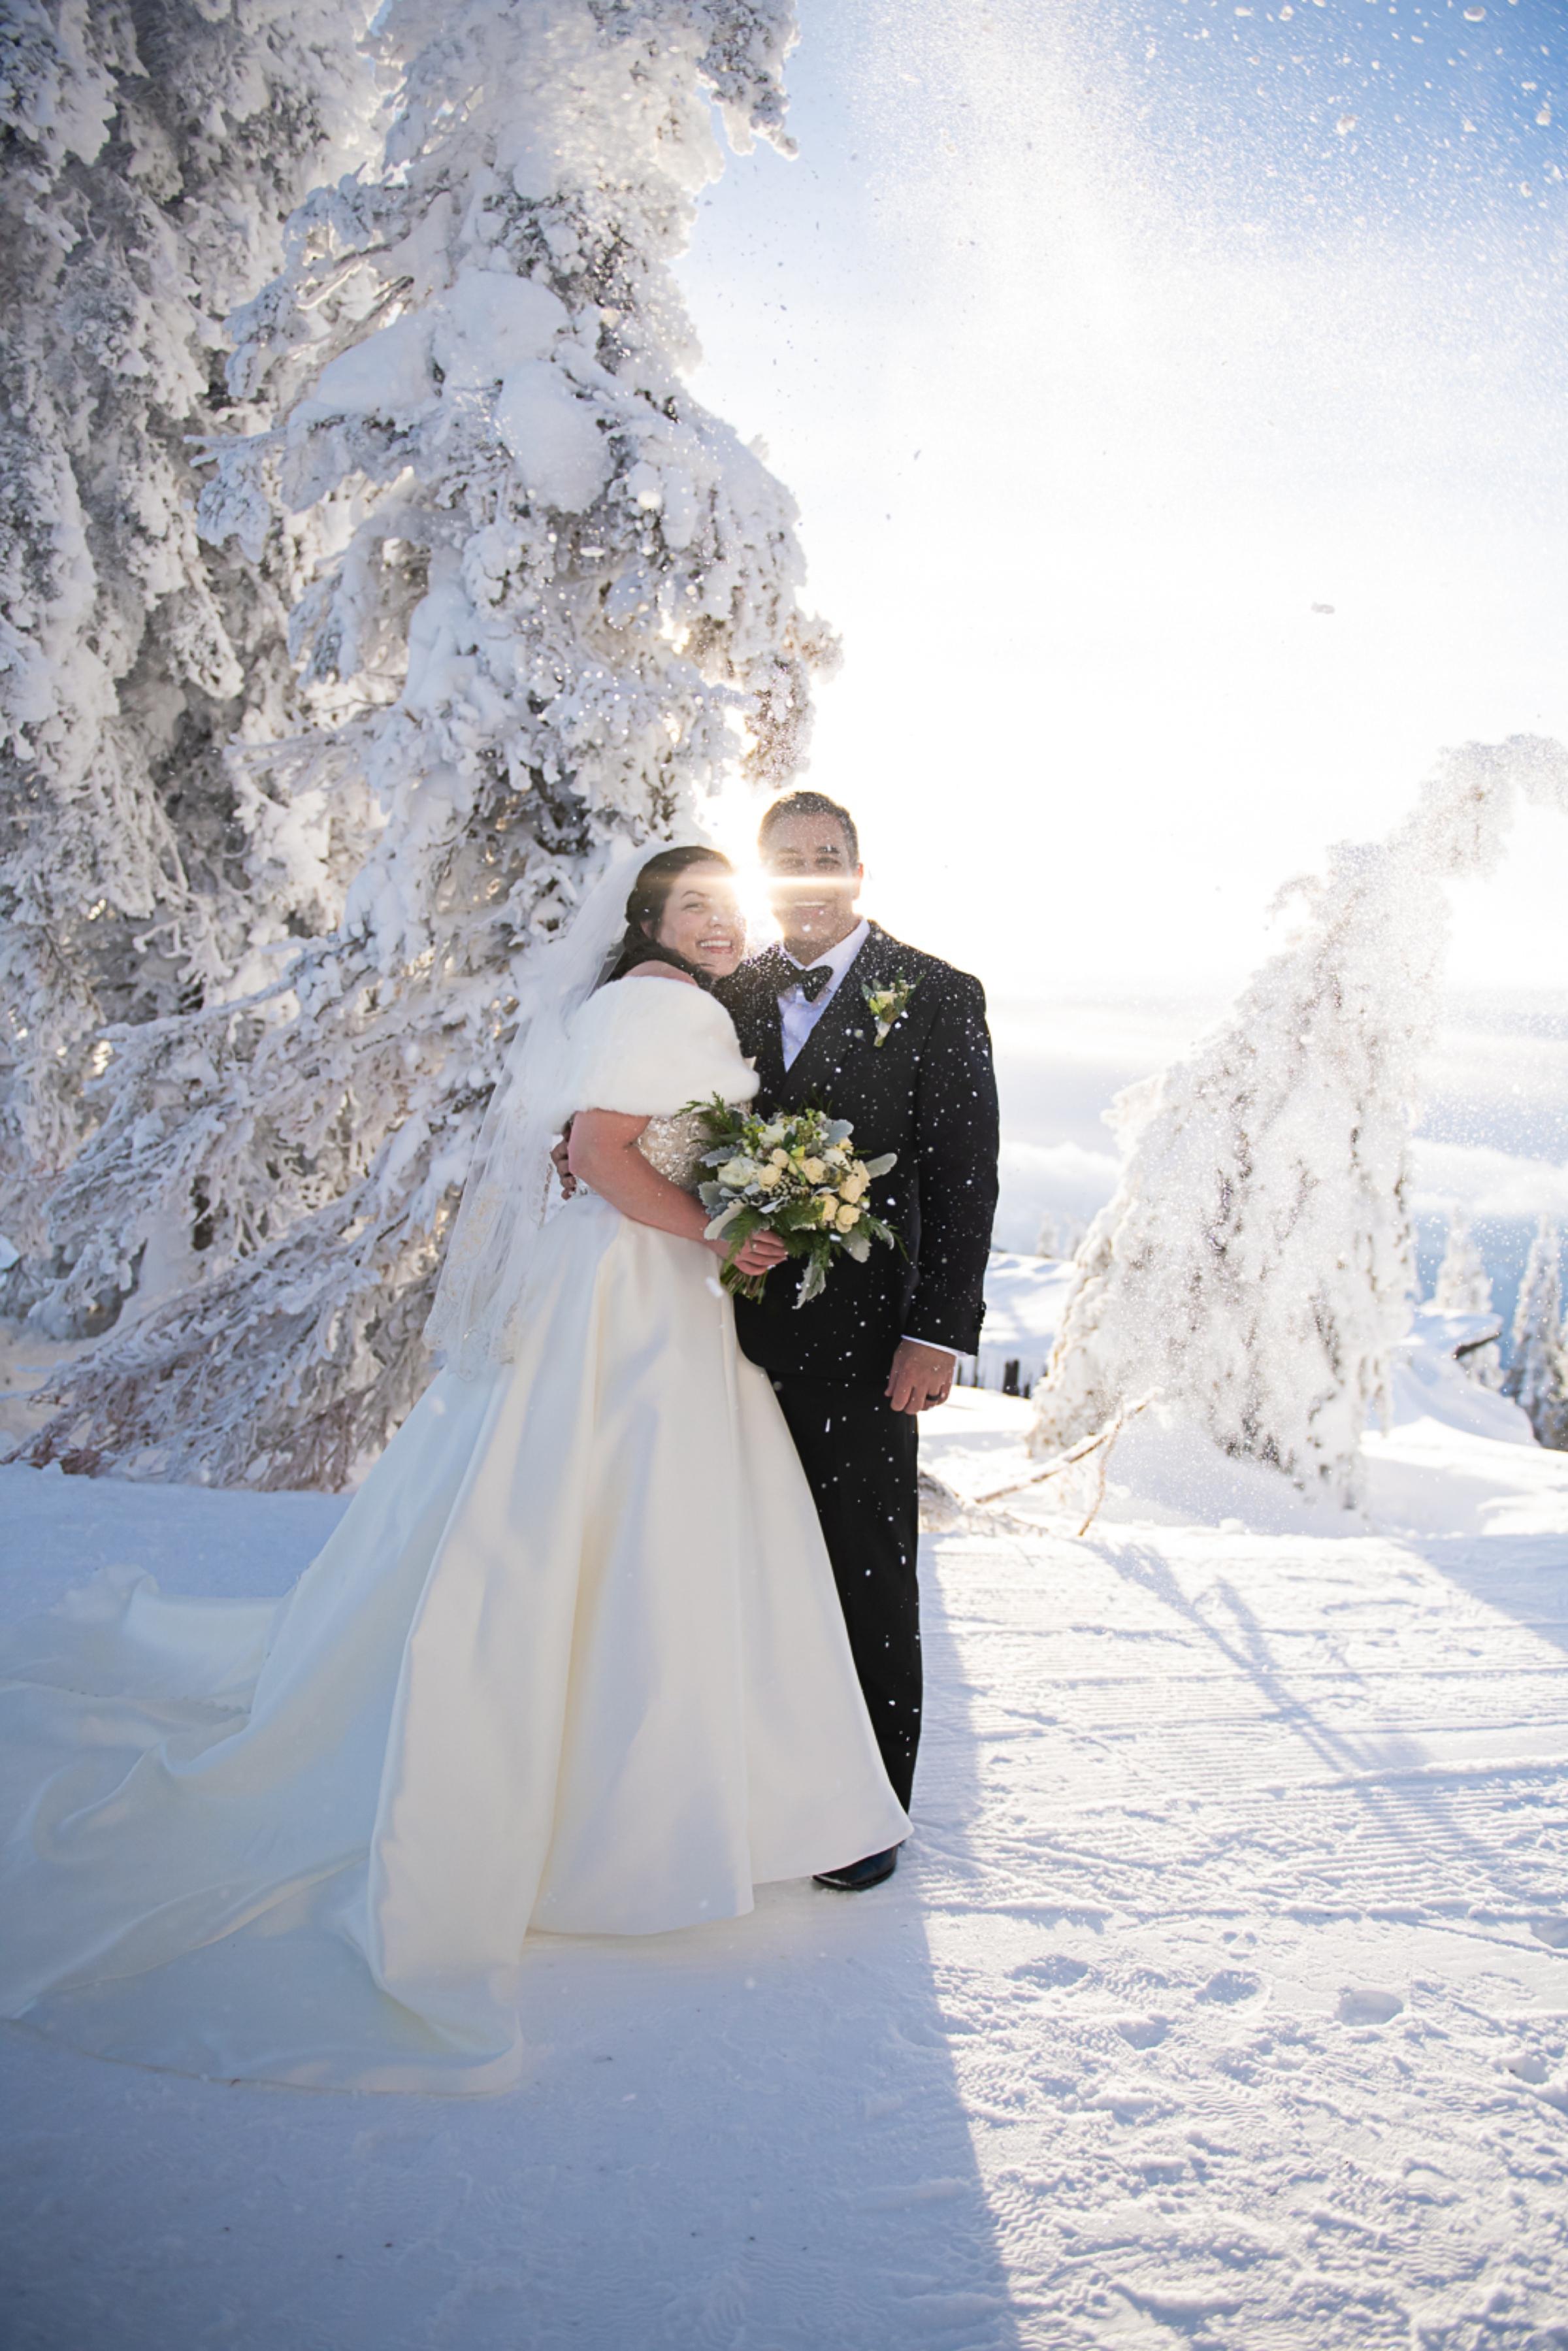 Janel-Gion-Wedding-Photographer-KristinRon-Sandpoint-Idaho.jpg_0015.jpg